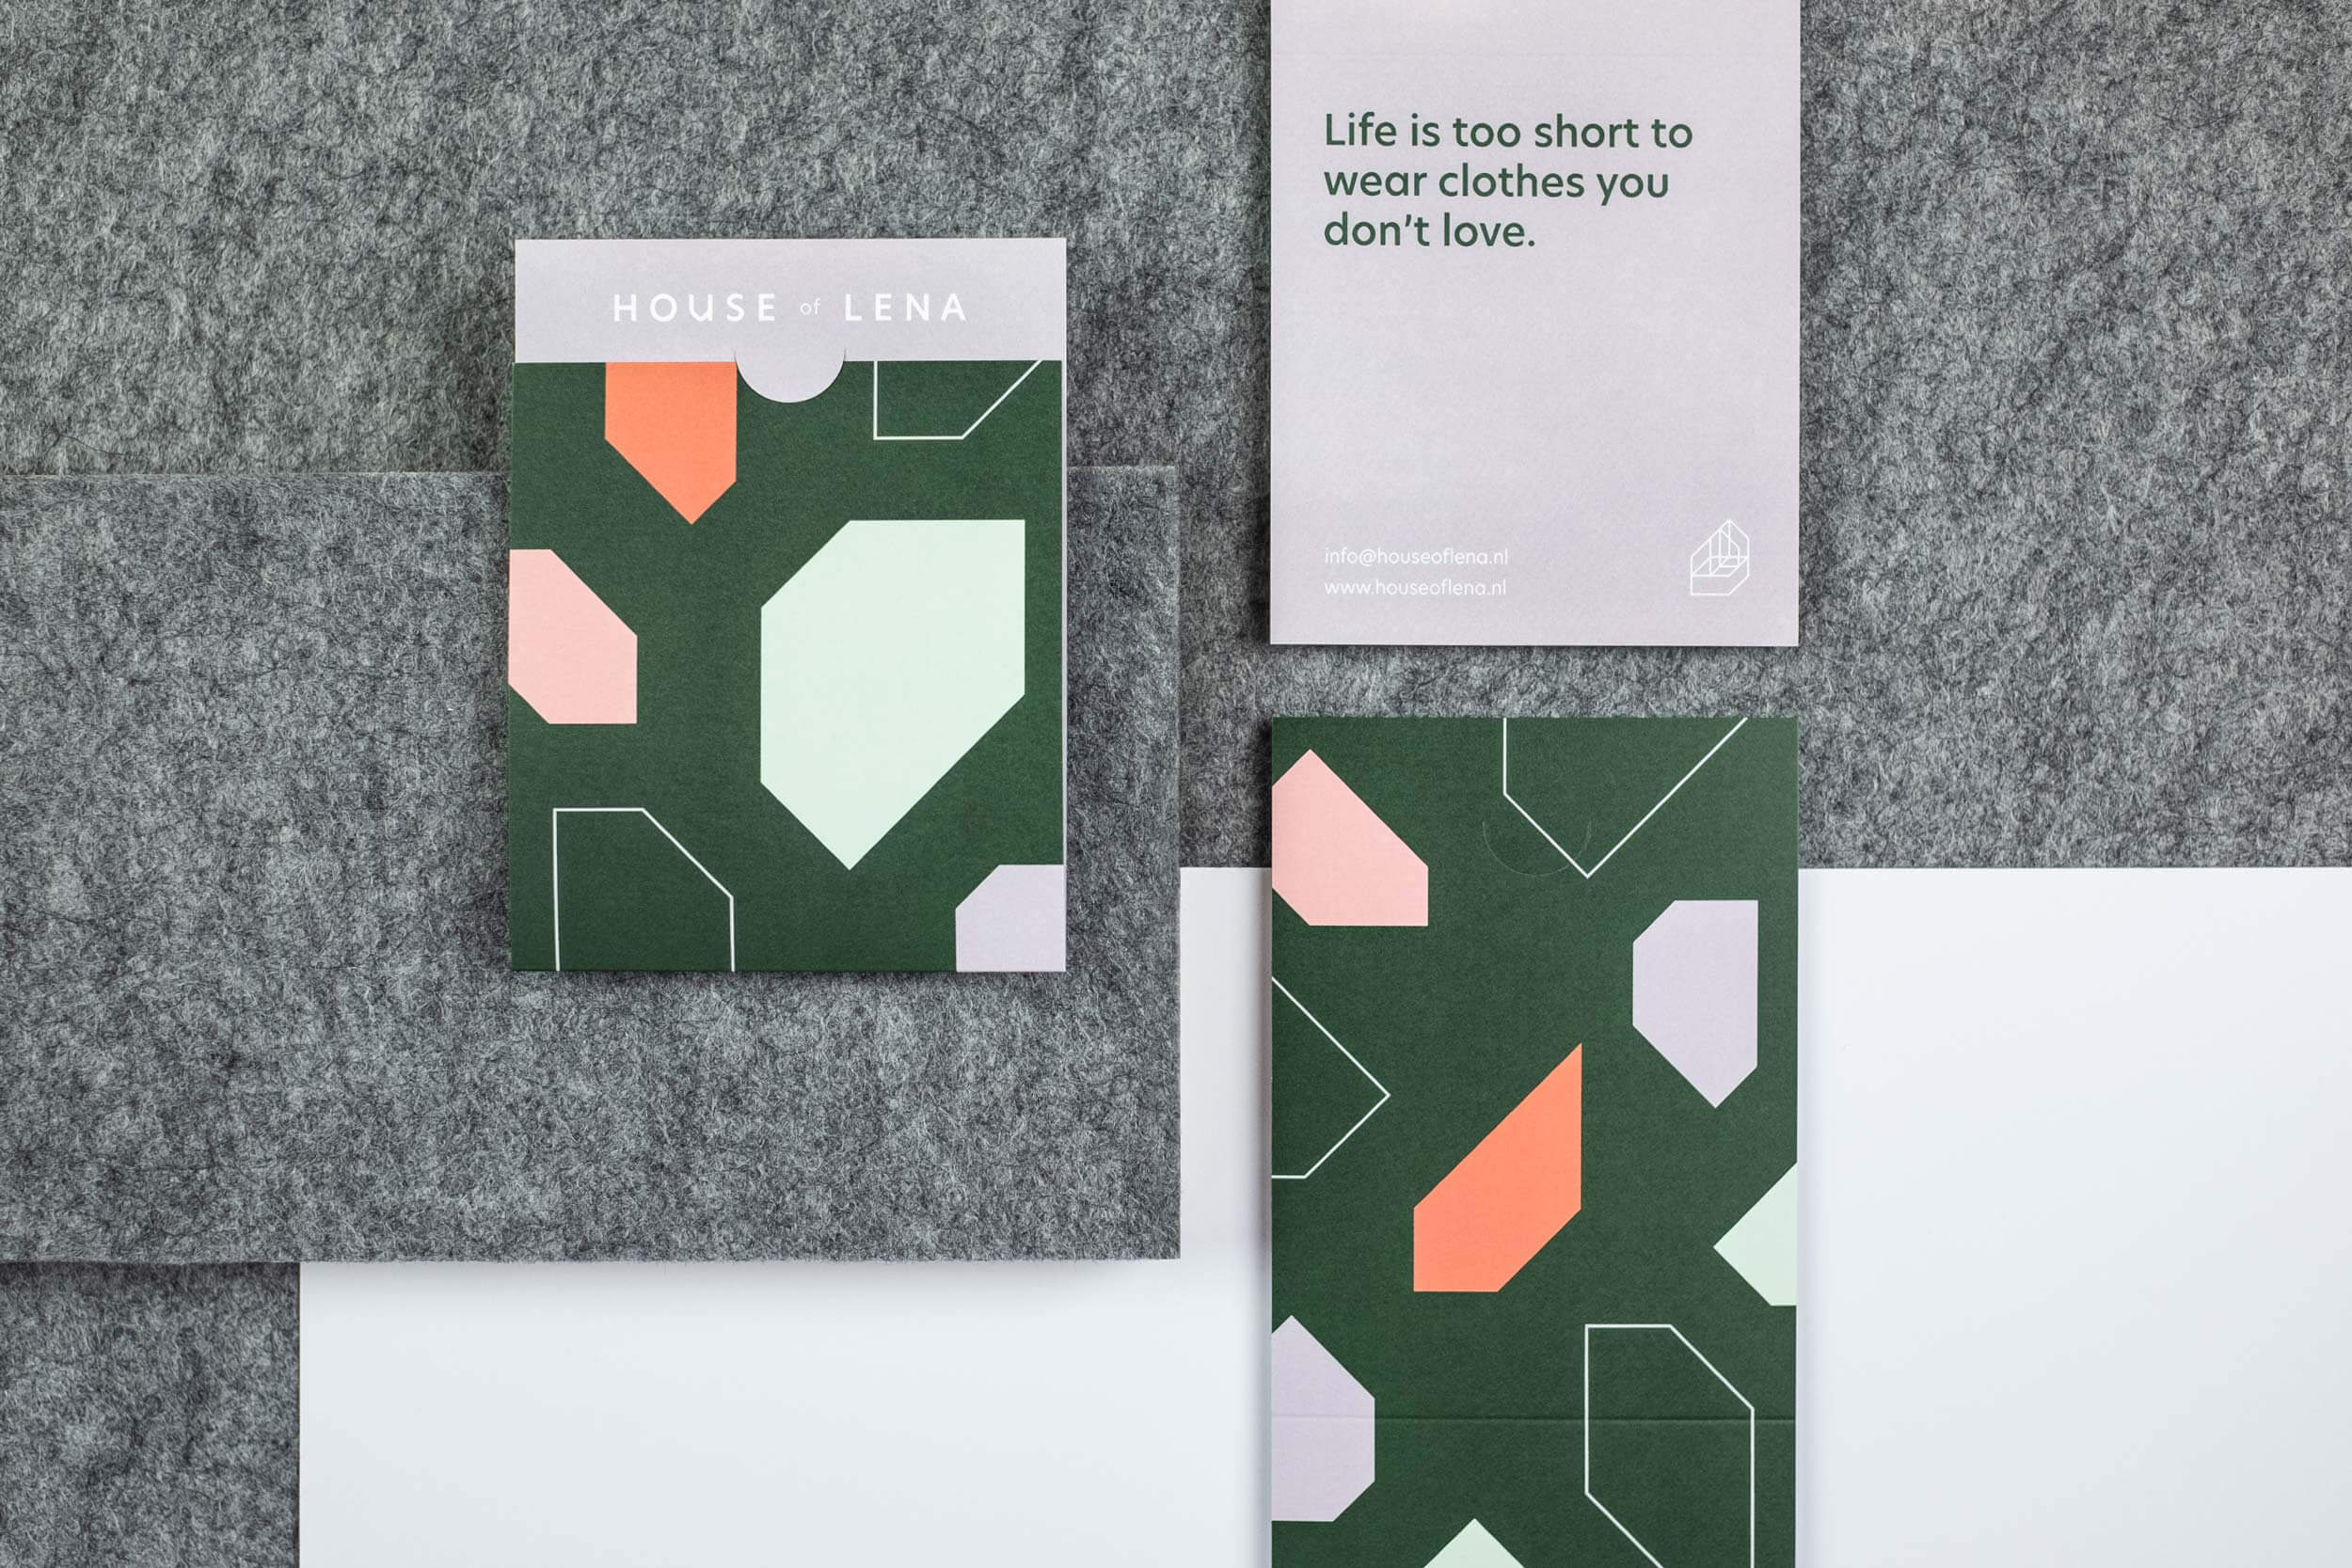 Drie bonnenboekjes van de grafische House of Lena identiteit.